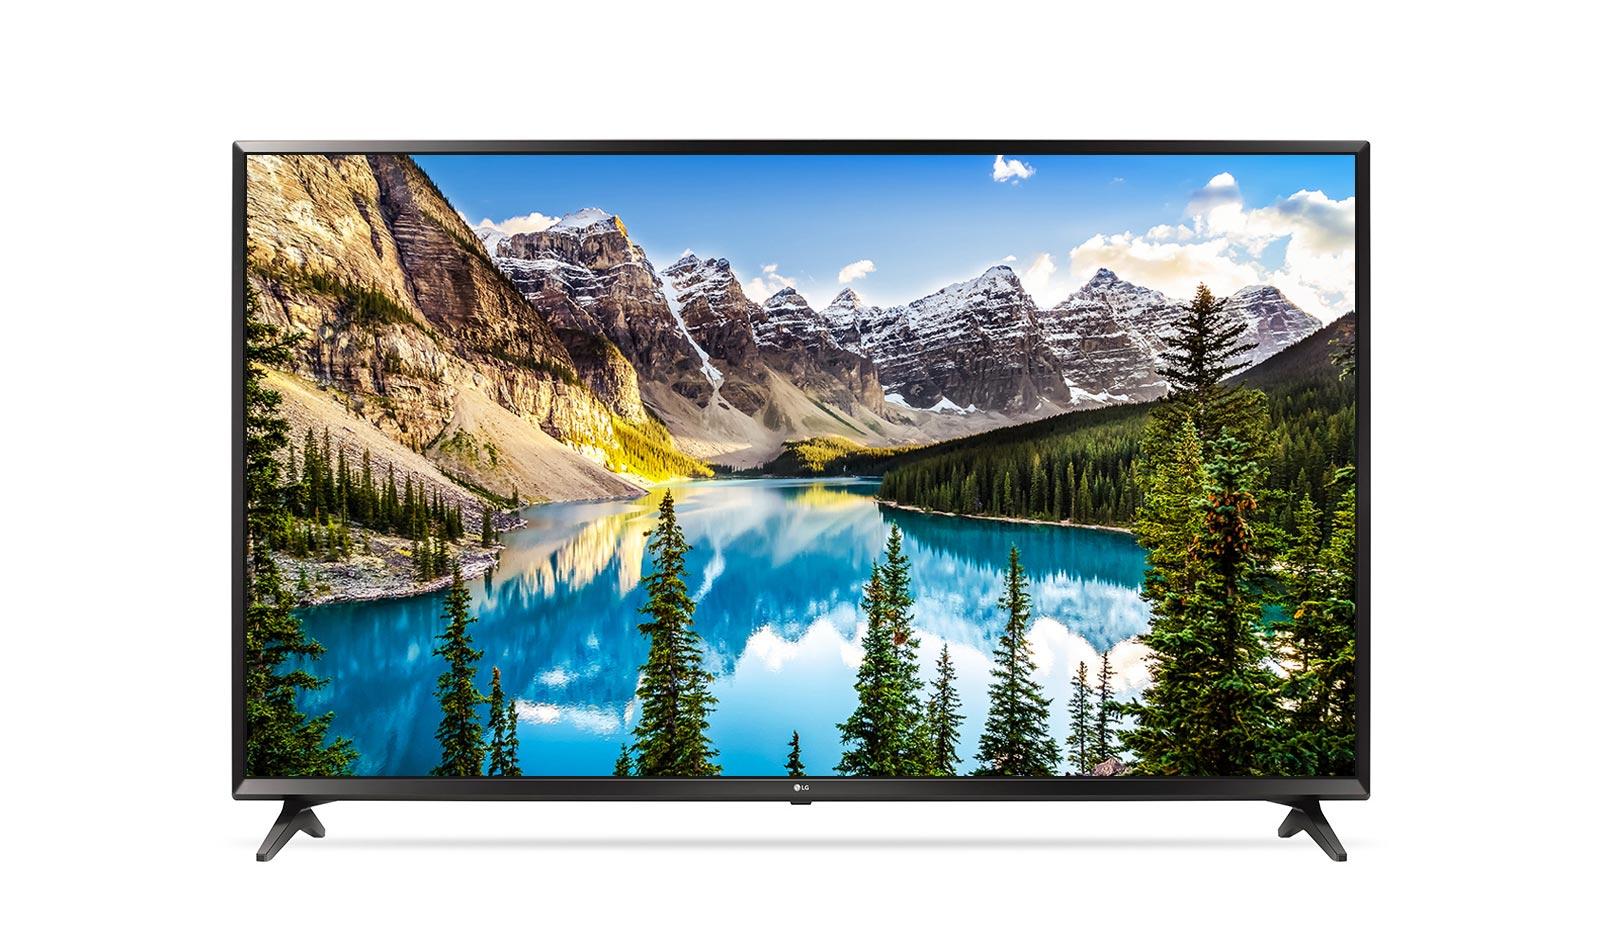 LG 55 Ultra HD 4K Smart Digital TV: 55UJ630V | LG South Africa